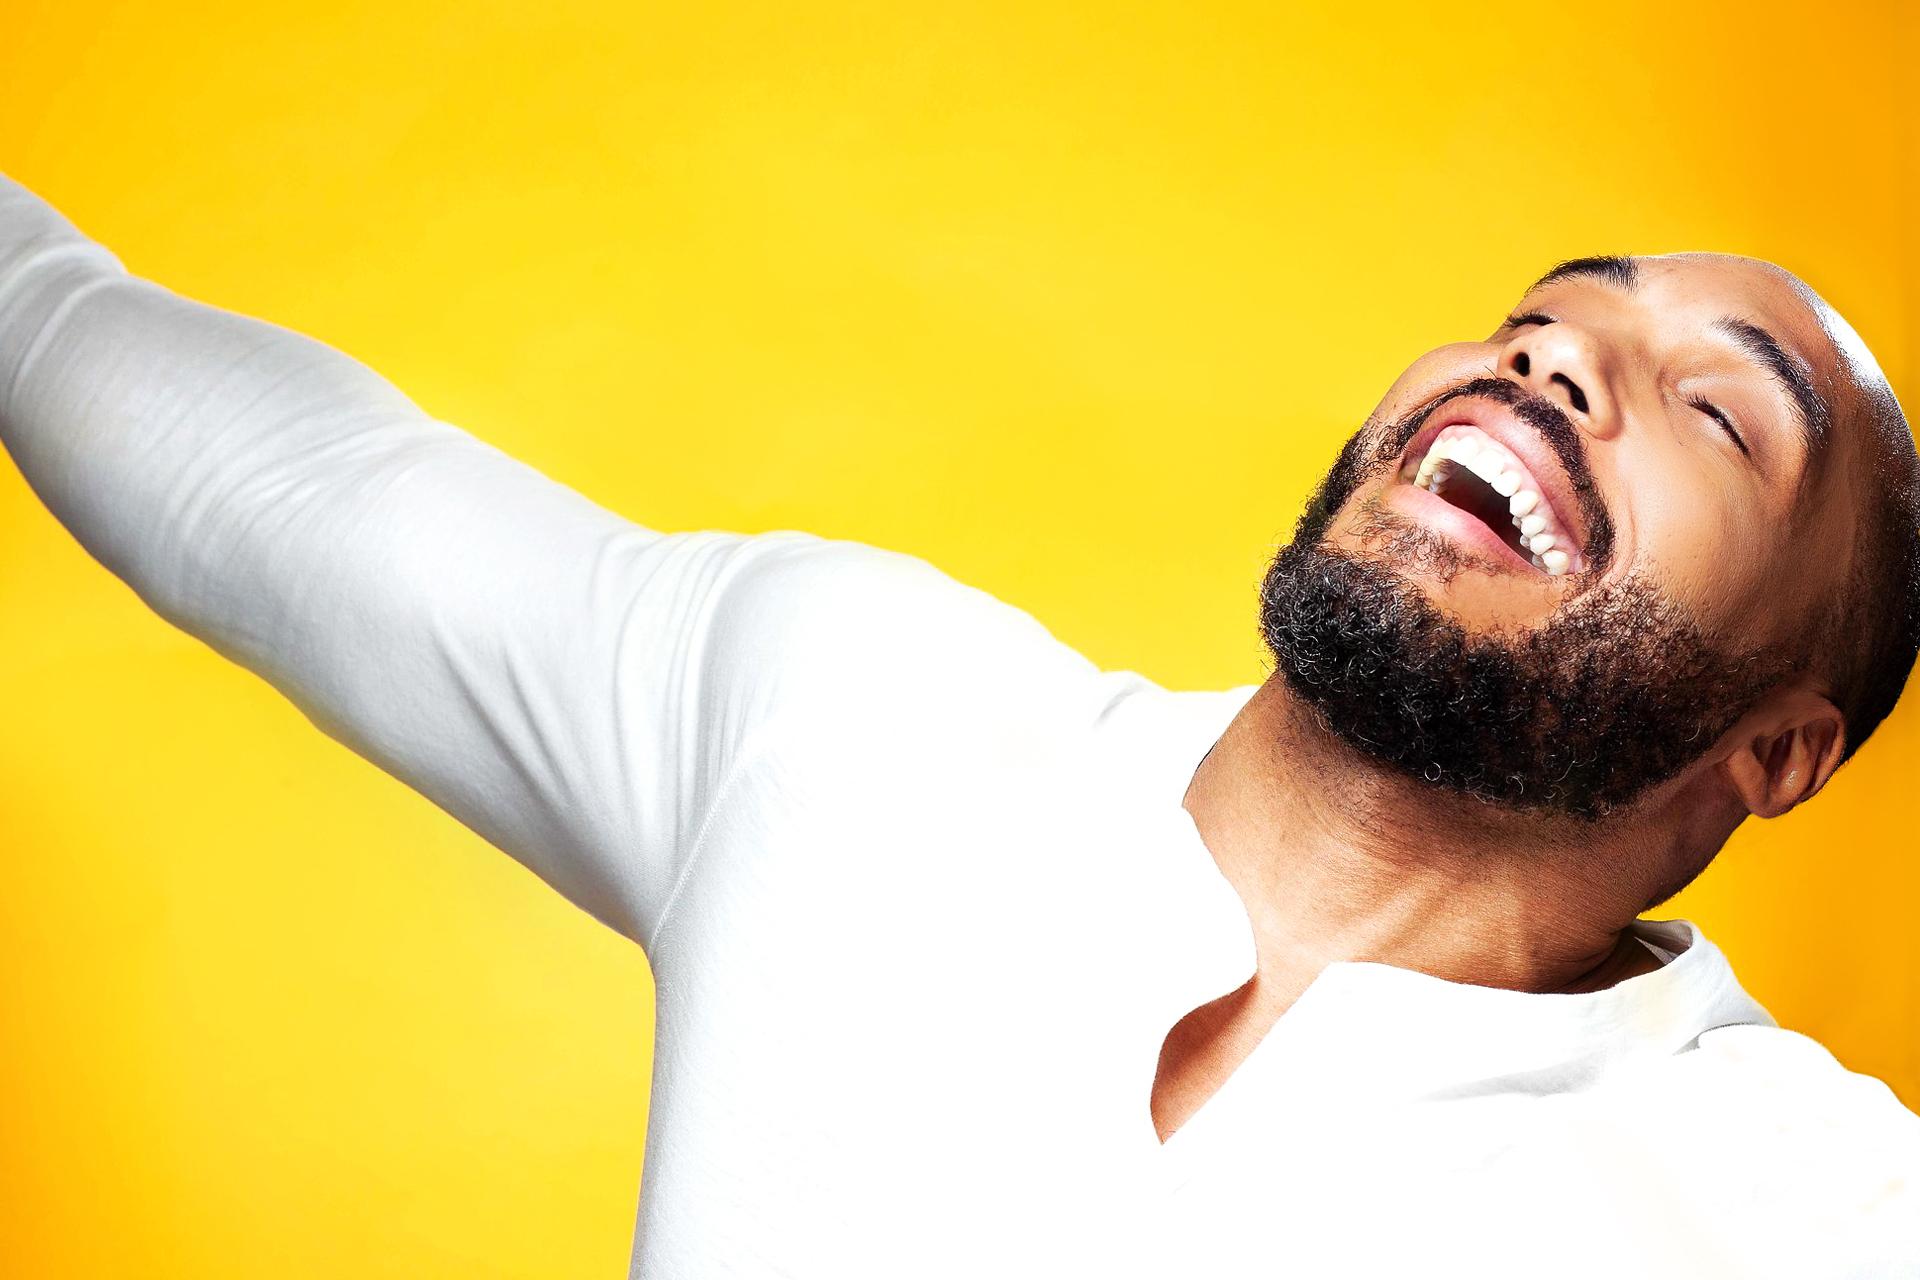 Rio Rocket - TV Film Voice Actor, Branding Expert, Motivational Speaker